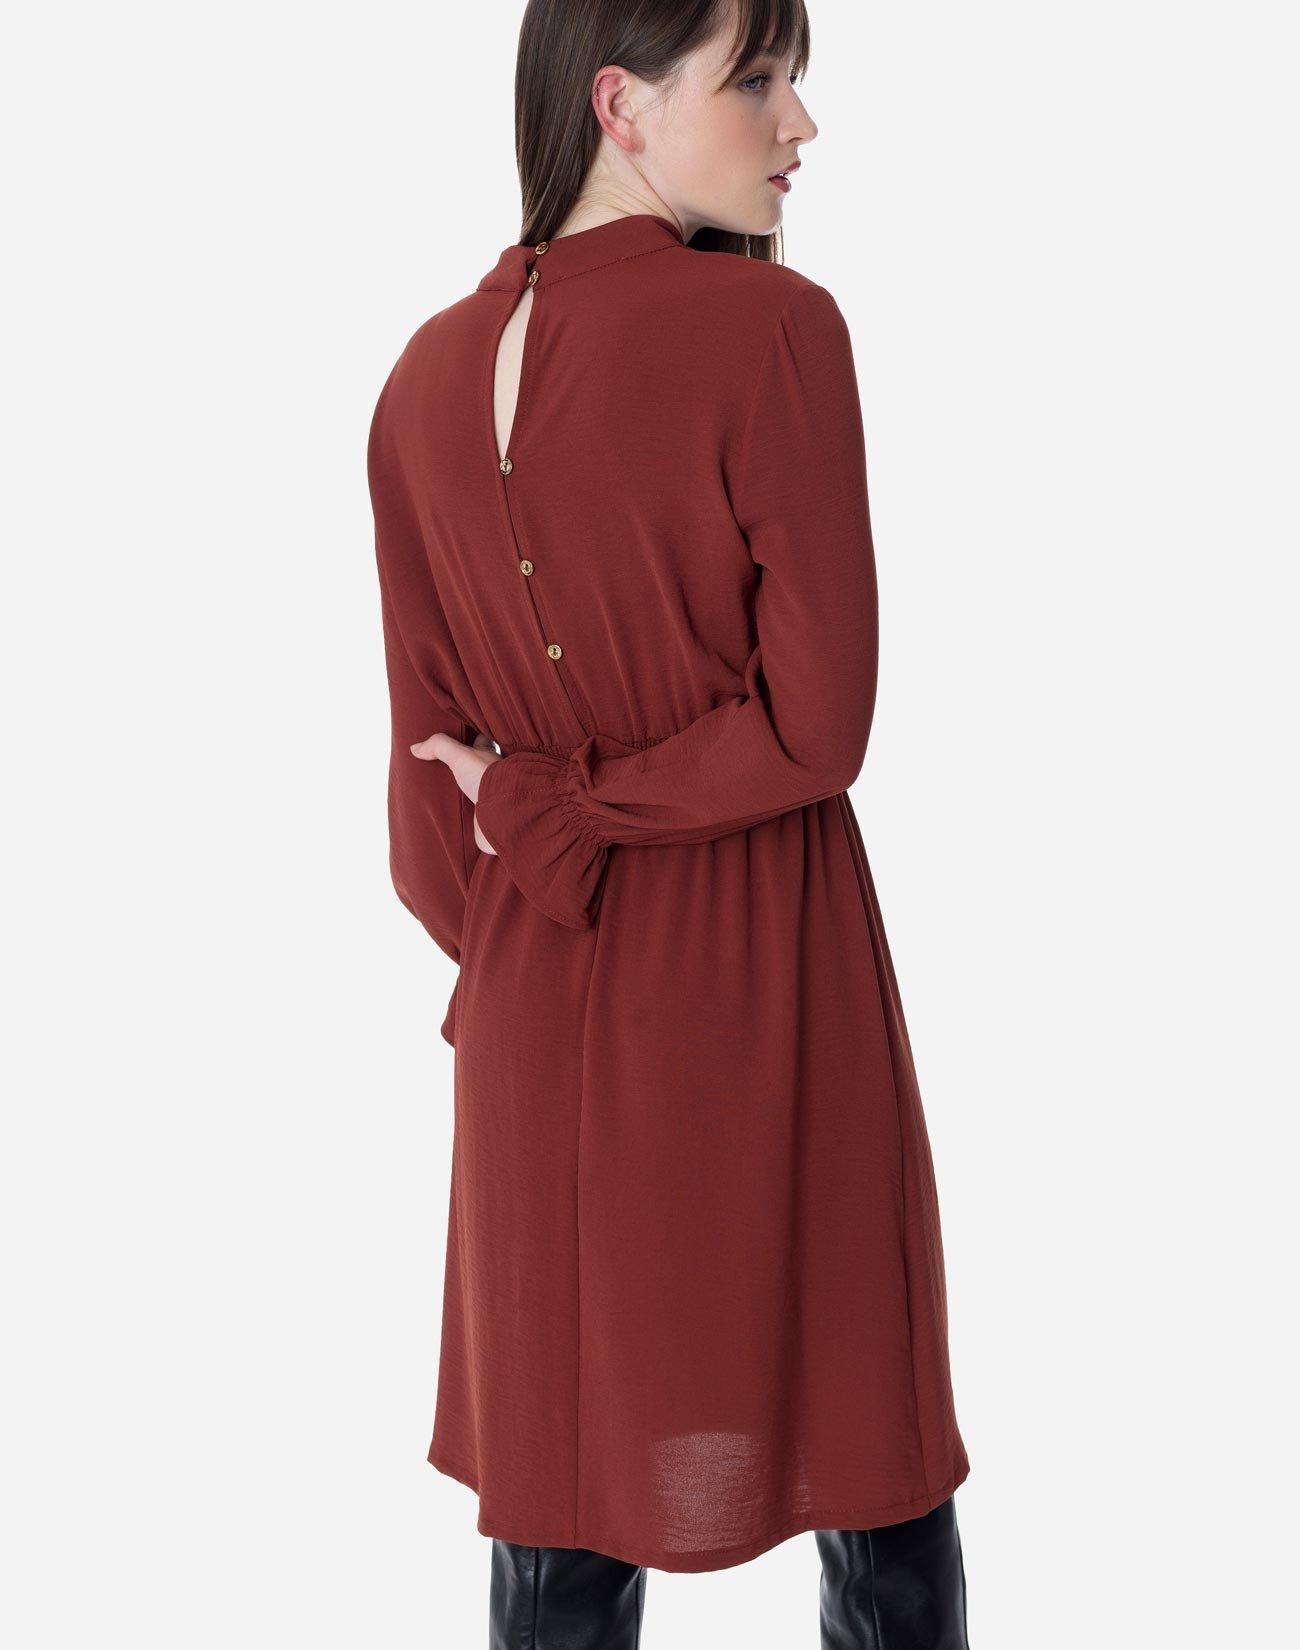 Midi dress with high neck